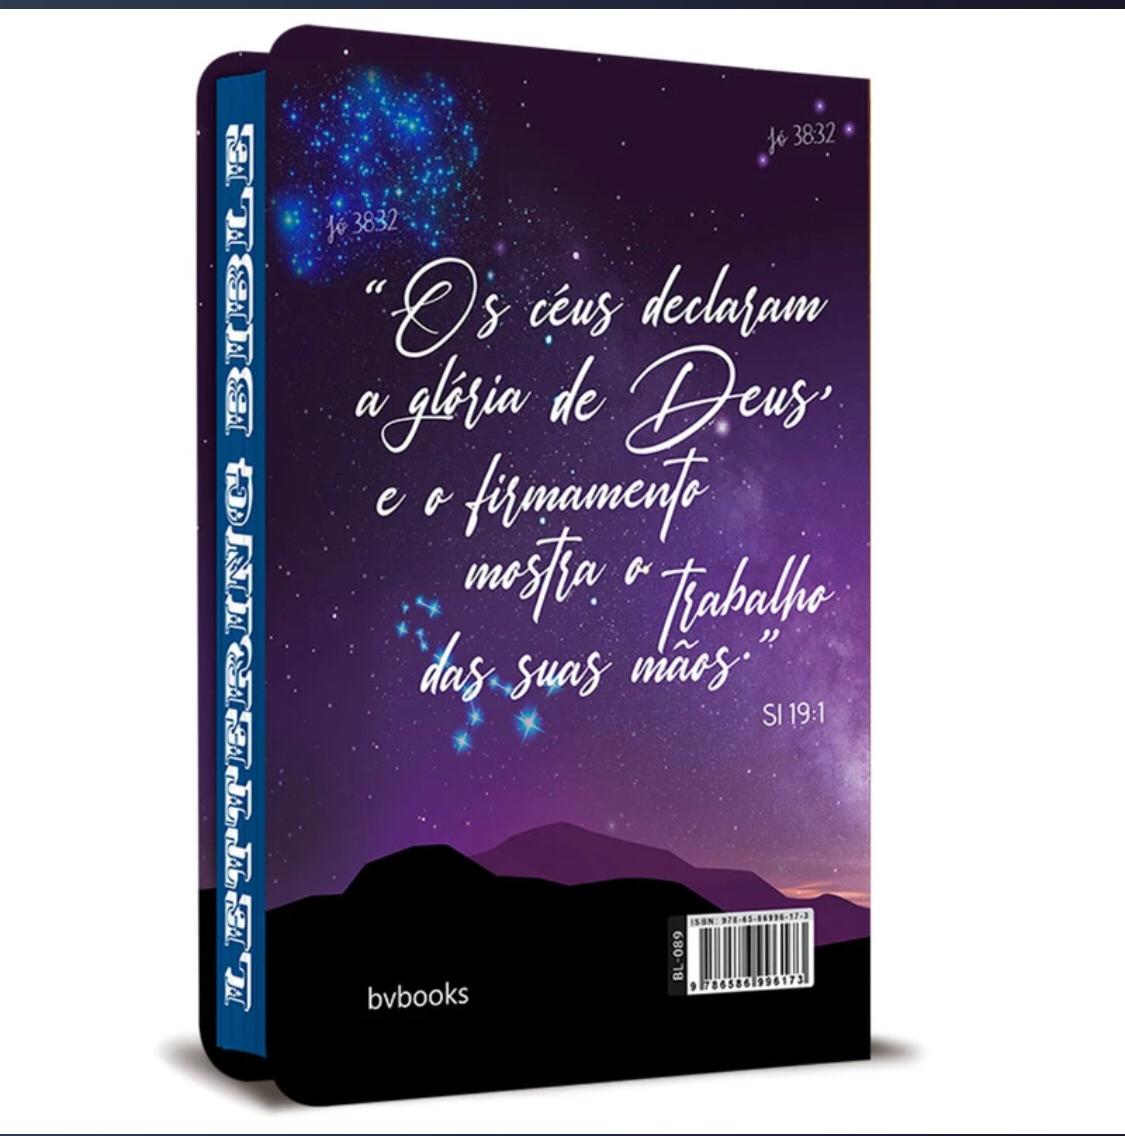 BIBLIA LETTERING BIBLE UNIVERSO BV